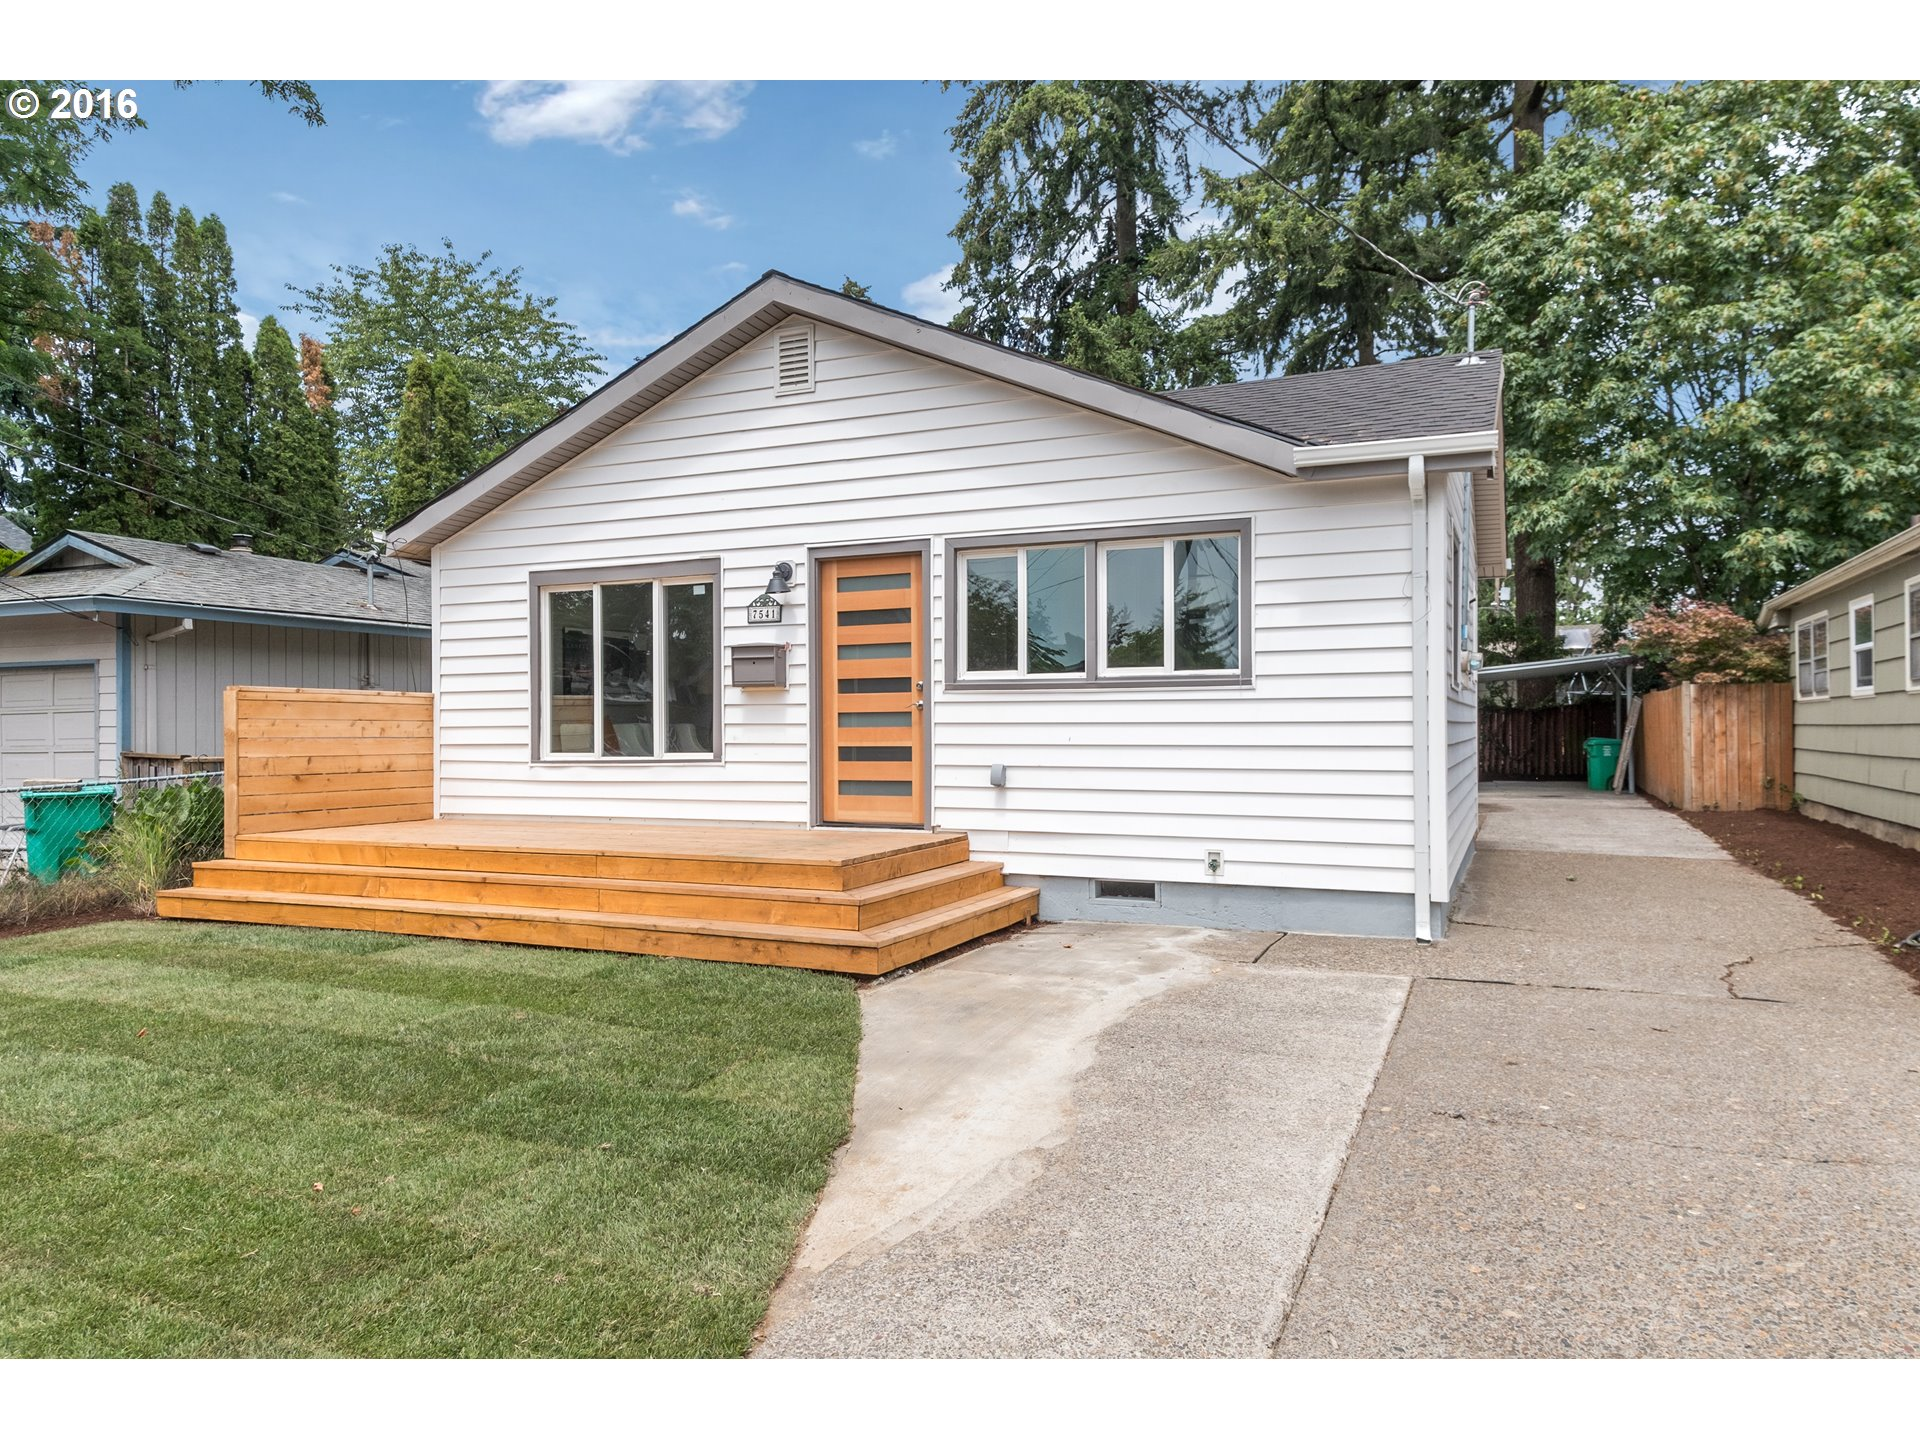 $350,000 - 3Br/1Ba -  for Sale in Foster-powell, Portland